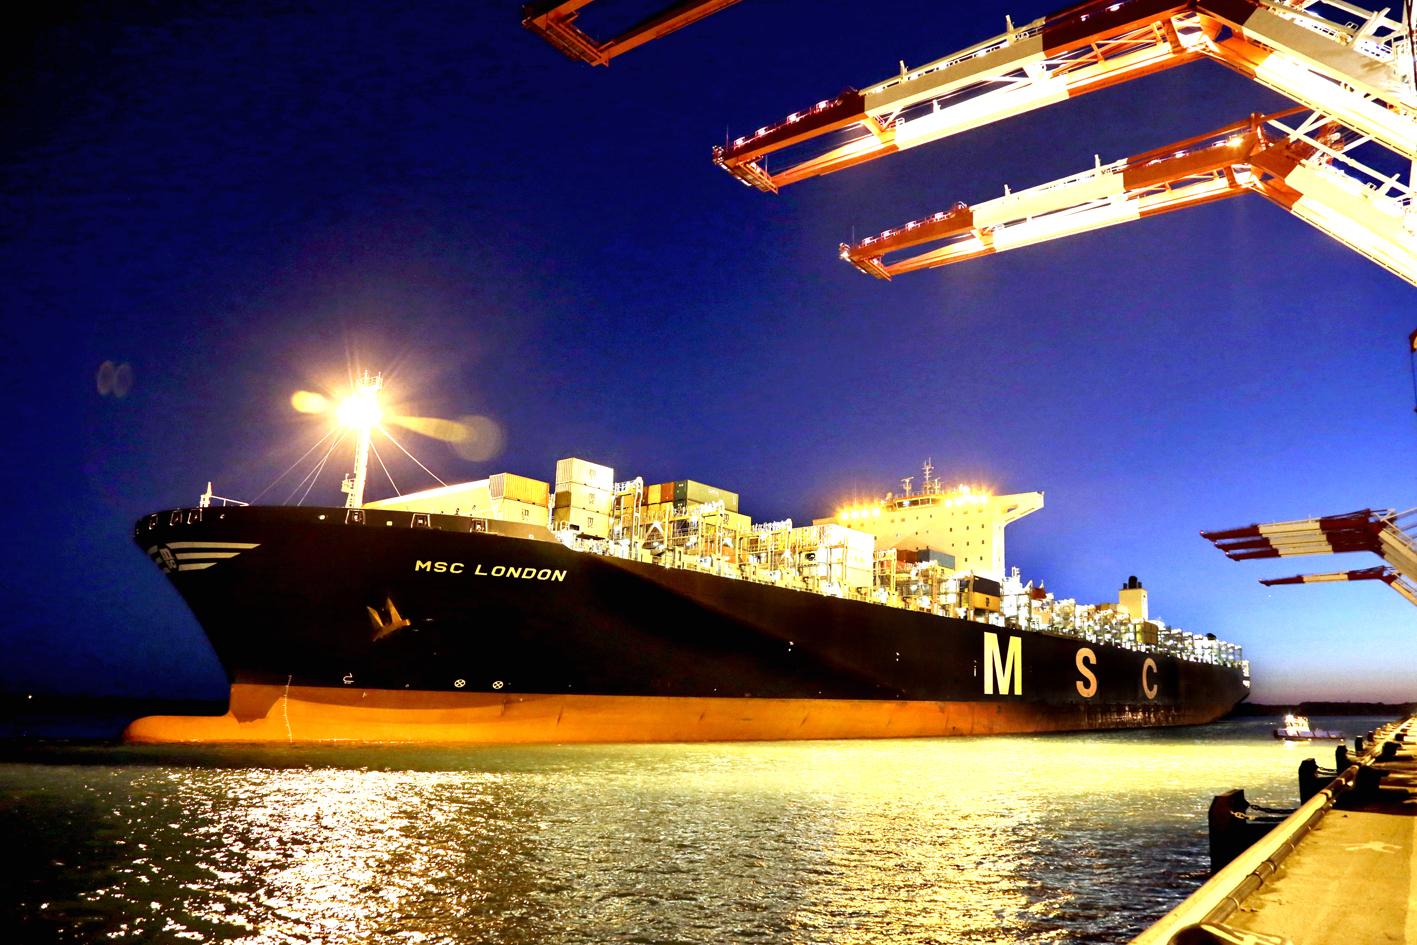 Hutchison's Barcelona box shop docks port's biggest, 16,600-TEU MSC London